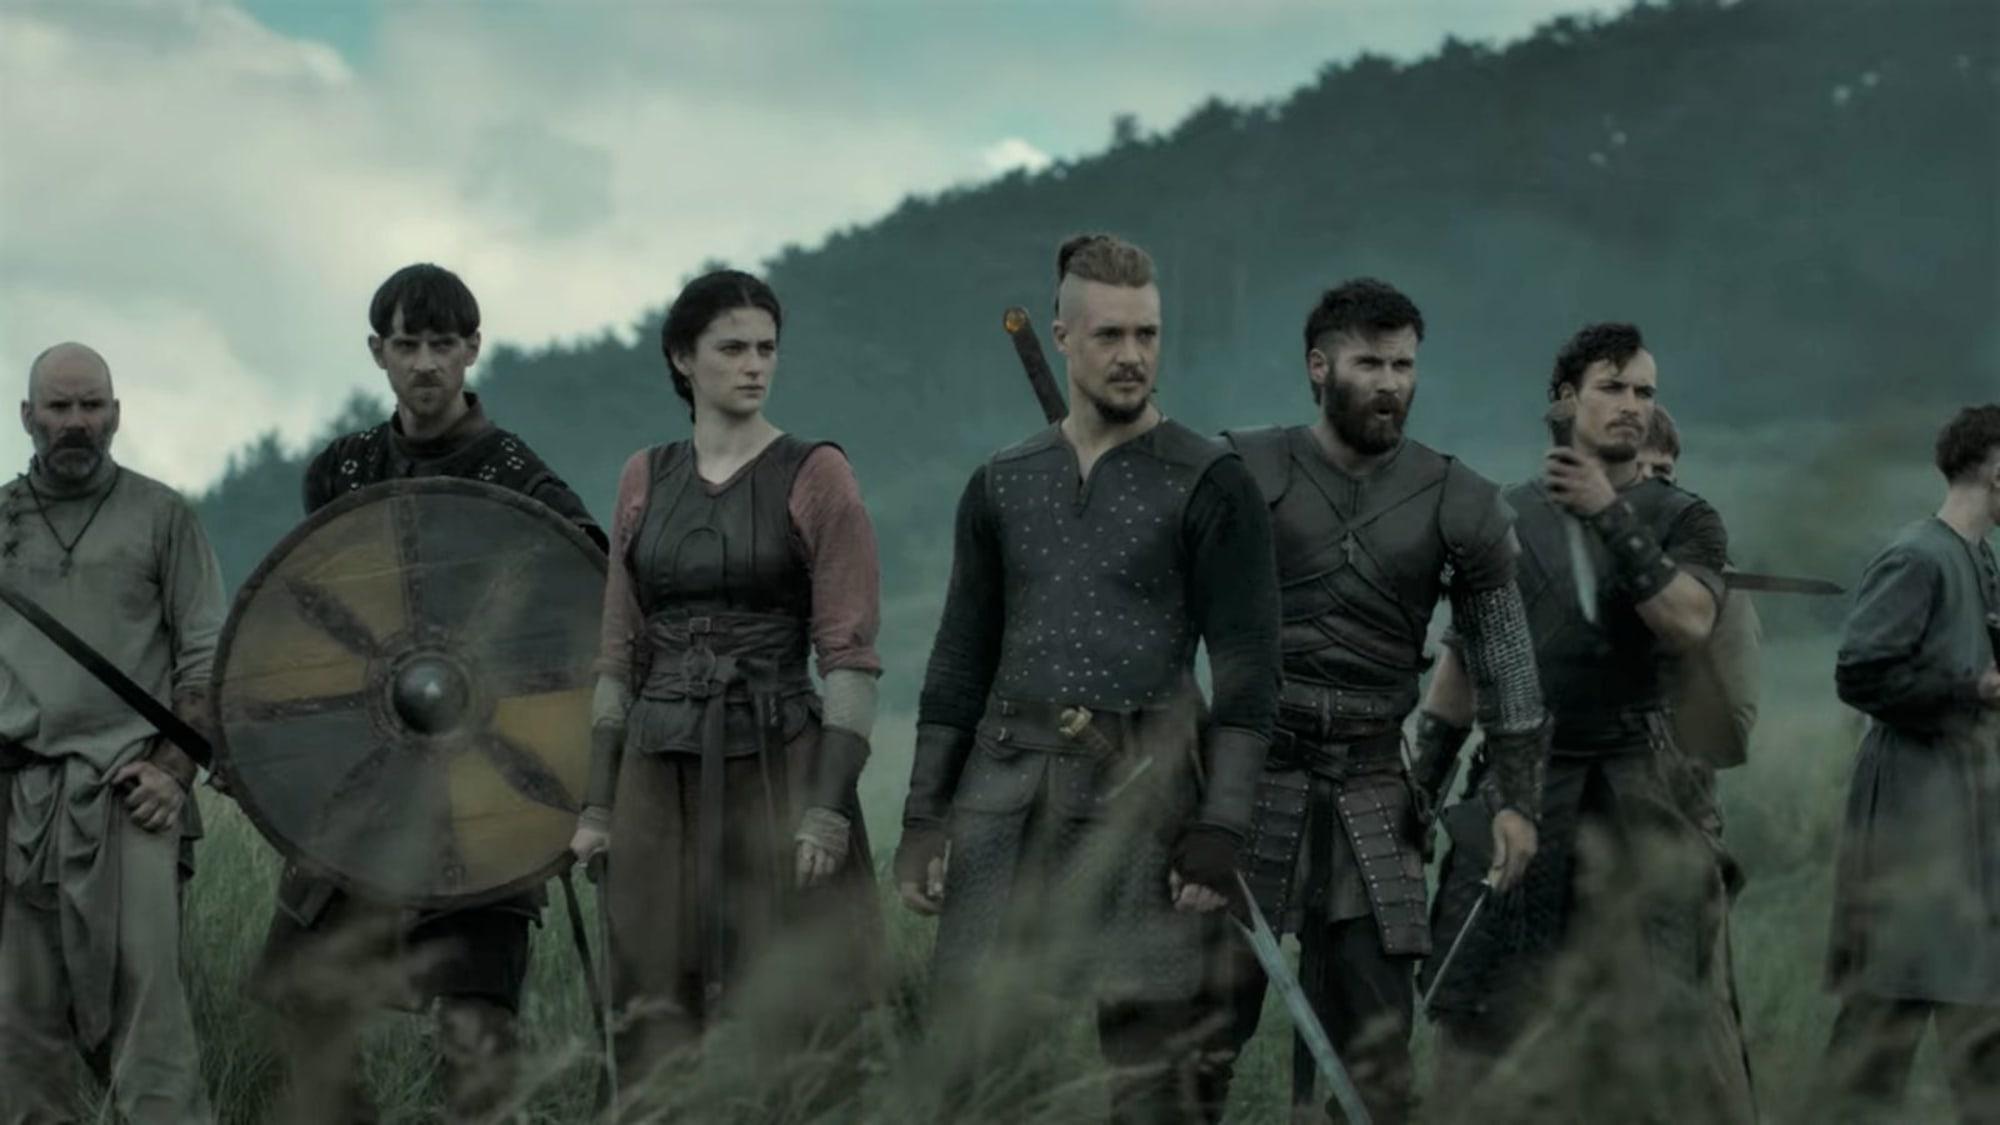 Let's break down the trailer for The Last Kingdom season 4, shot by shot